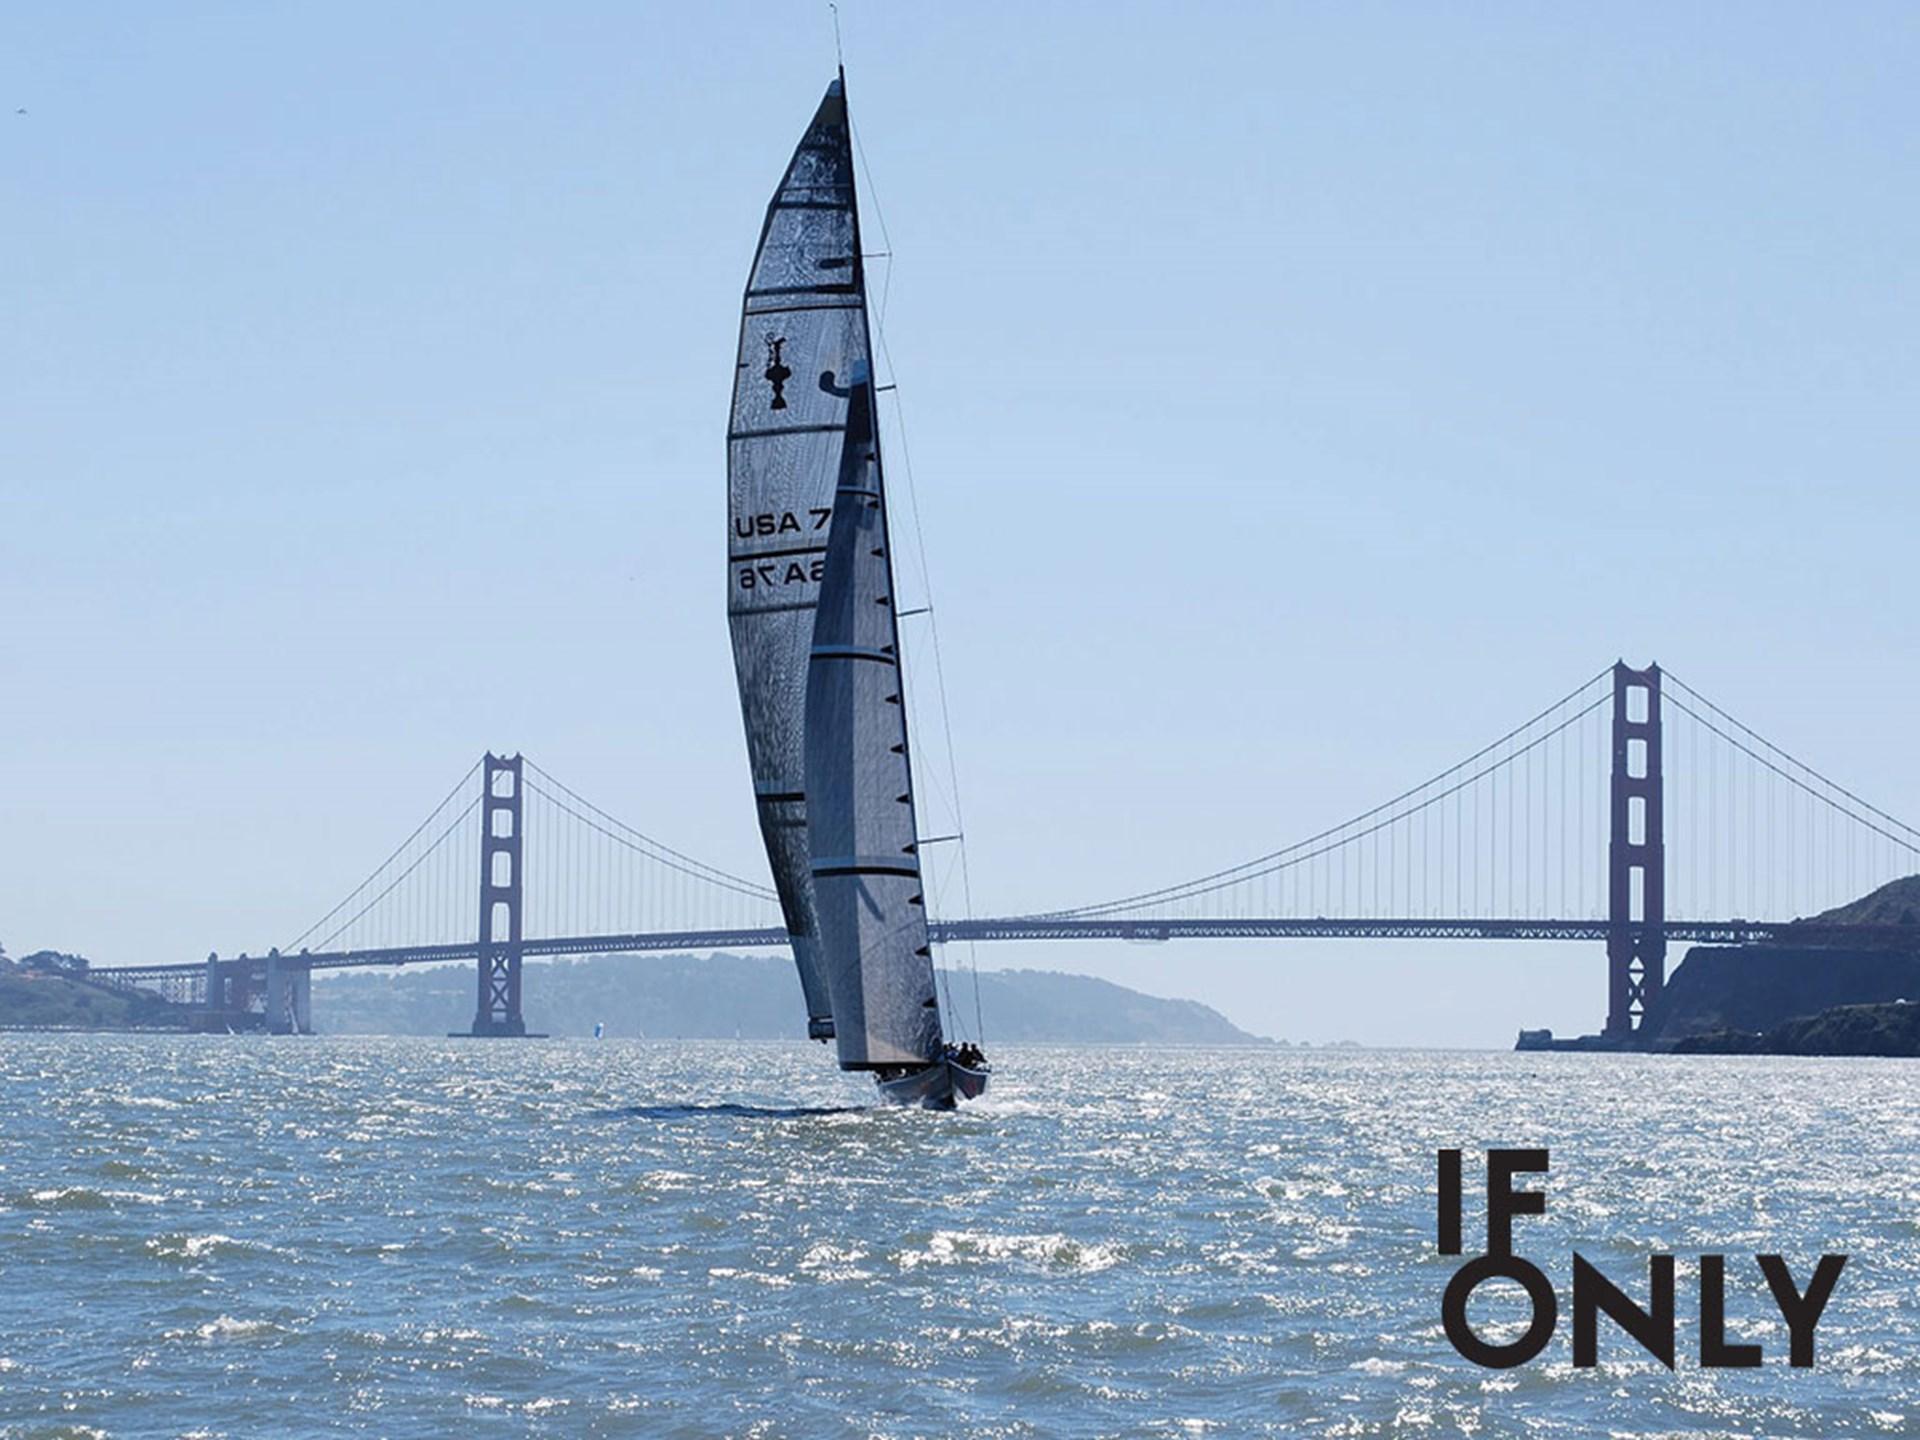 Sail with America's Cup Champion Brad Webb on USA 76